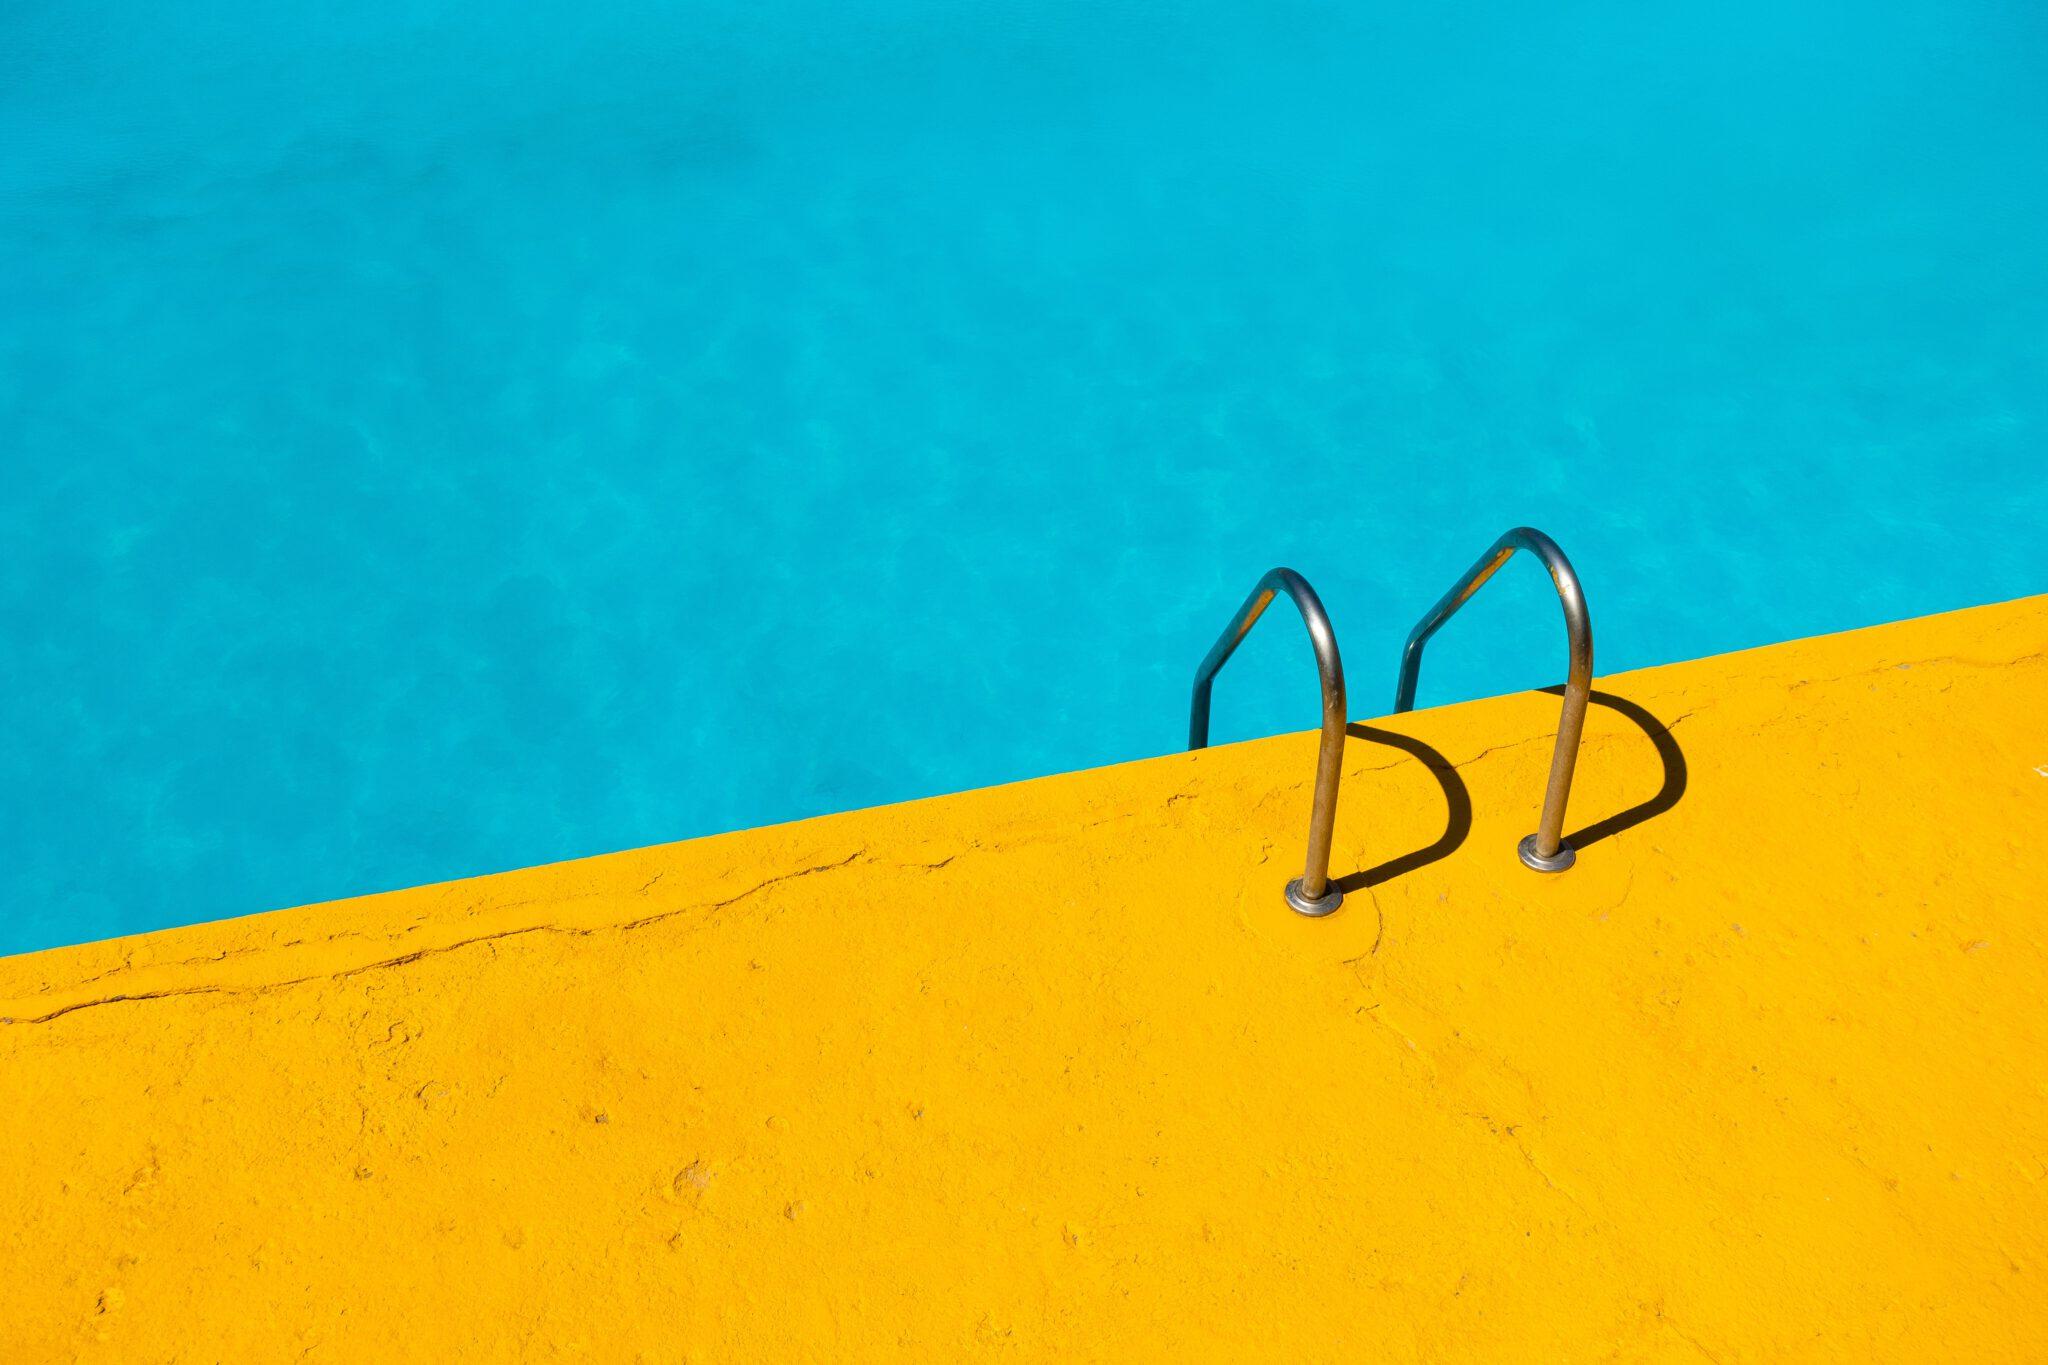 Pool © Unsplash/Etienne Girardet